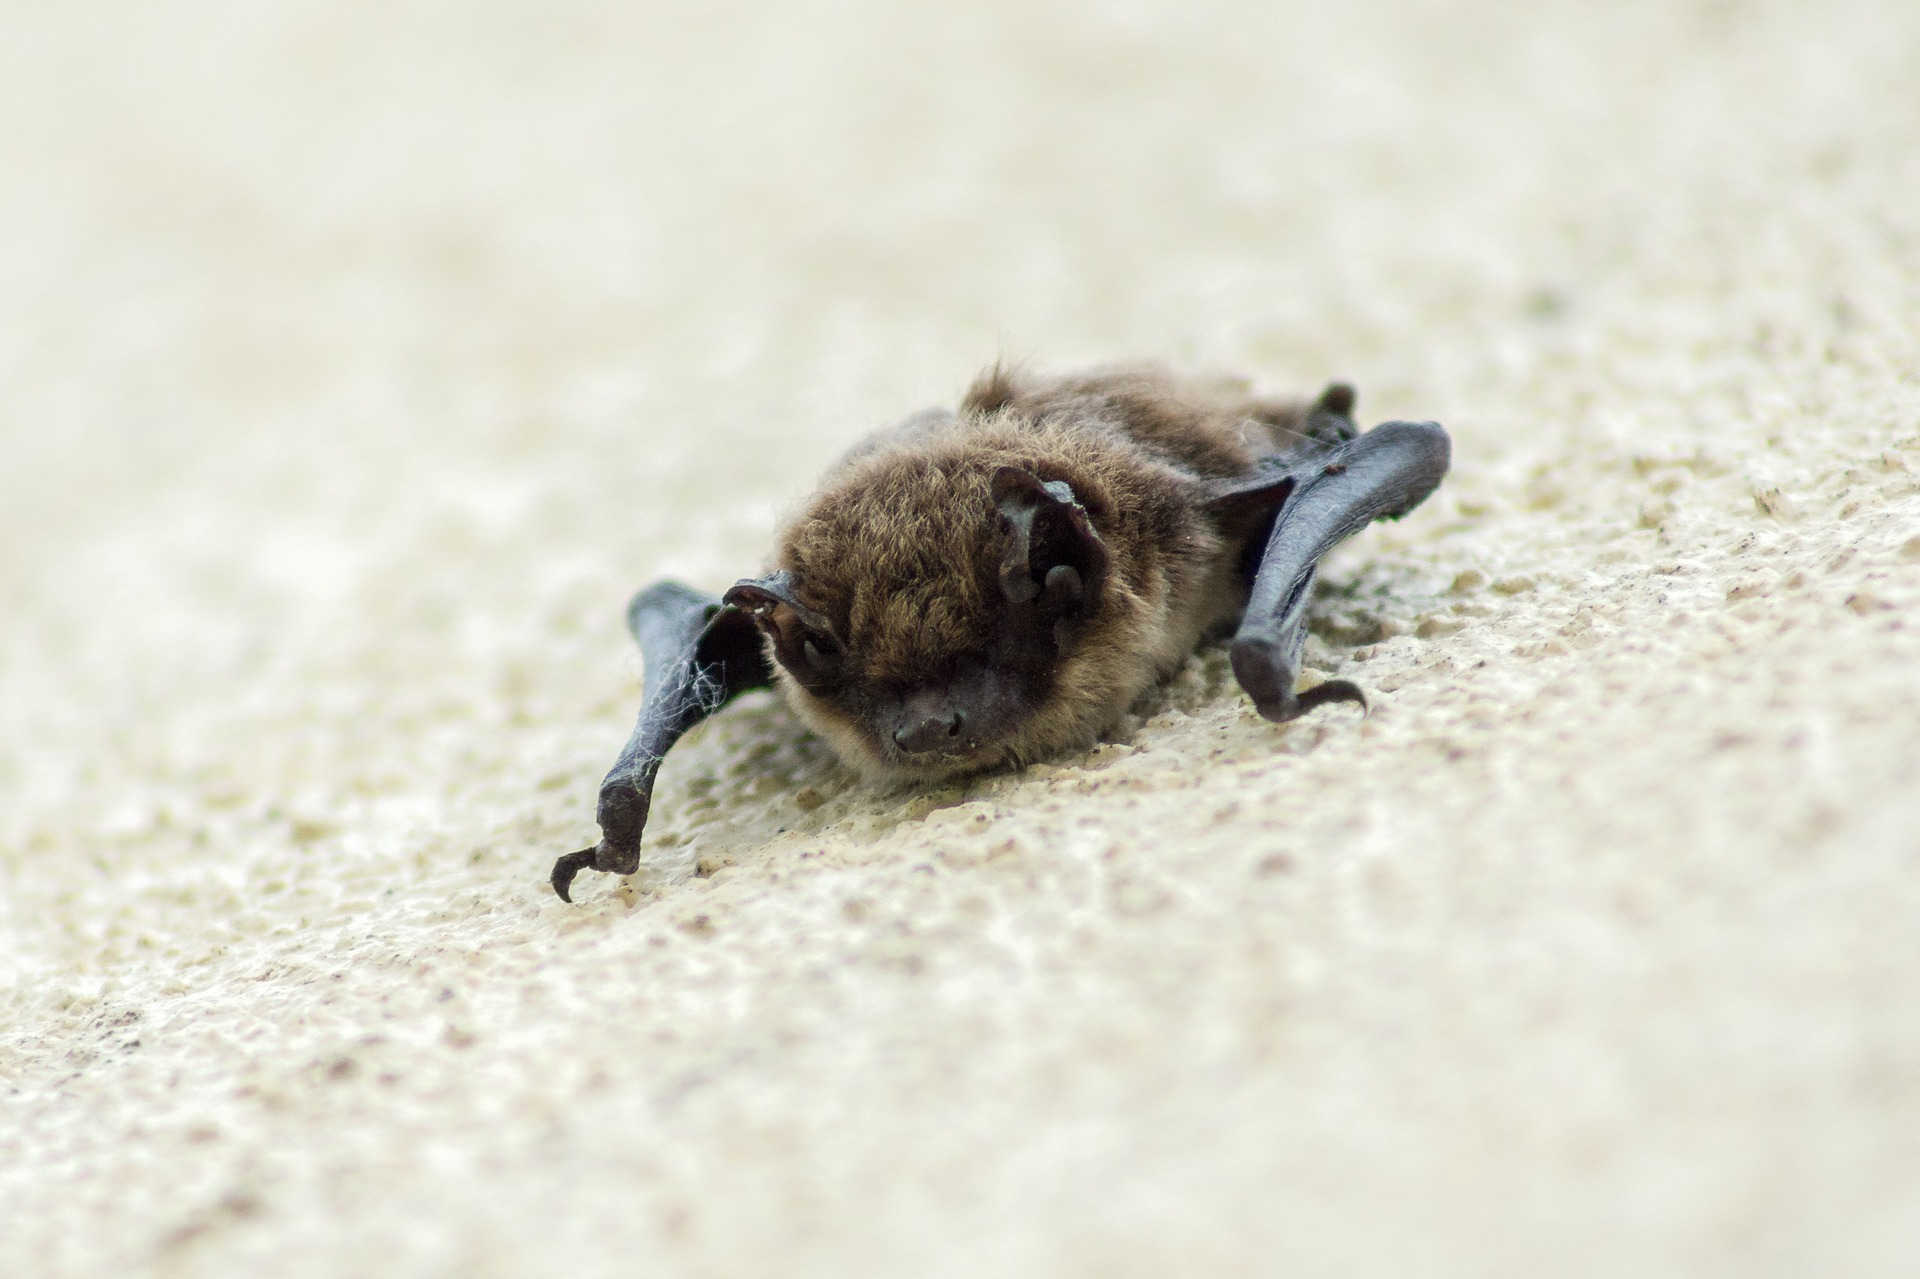 Photo of a Fringed Myotis bat